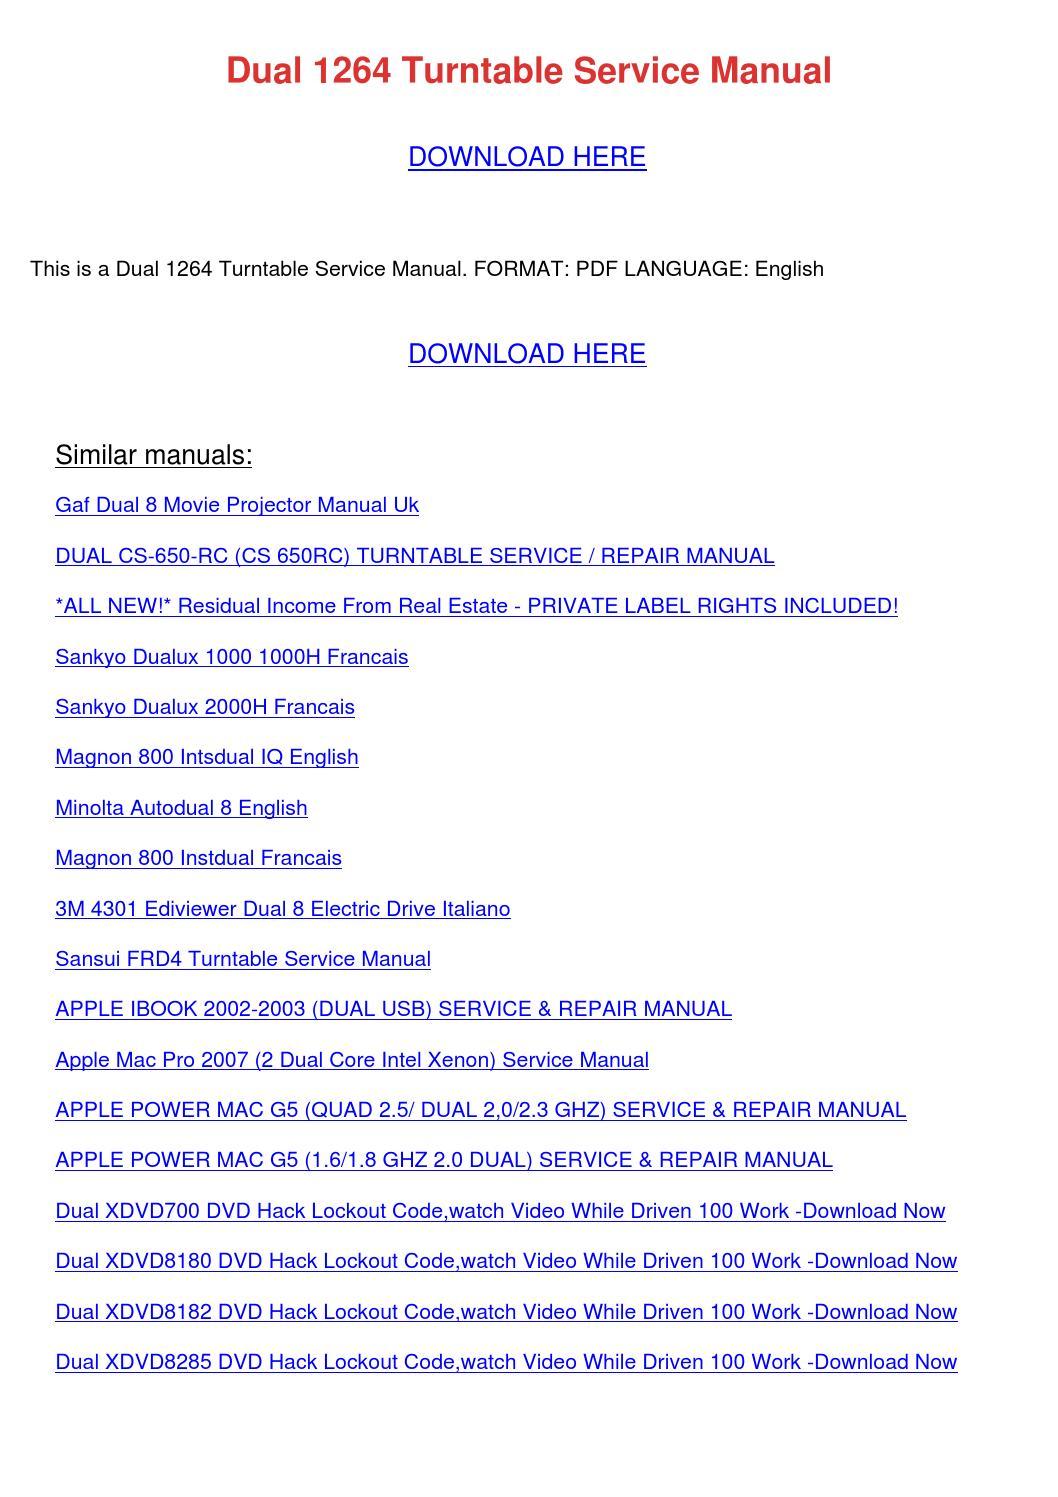 get ready for ios 12 Array - dual 1264 turntable service manual by  kristoferkeeney issuu rh issuu ...